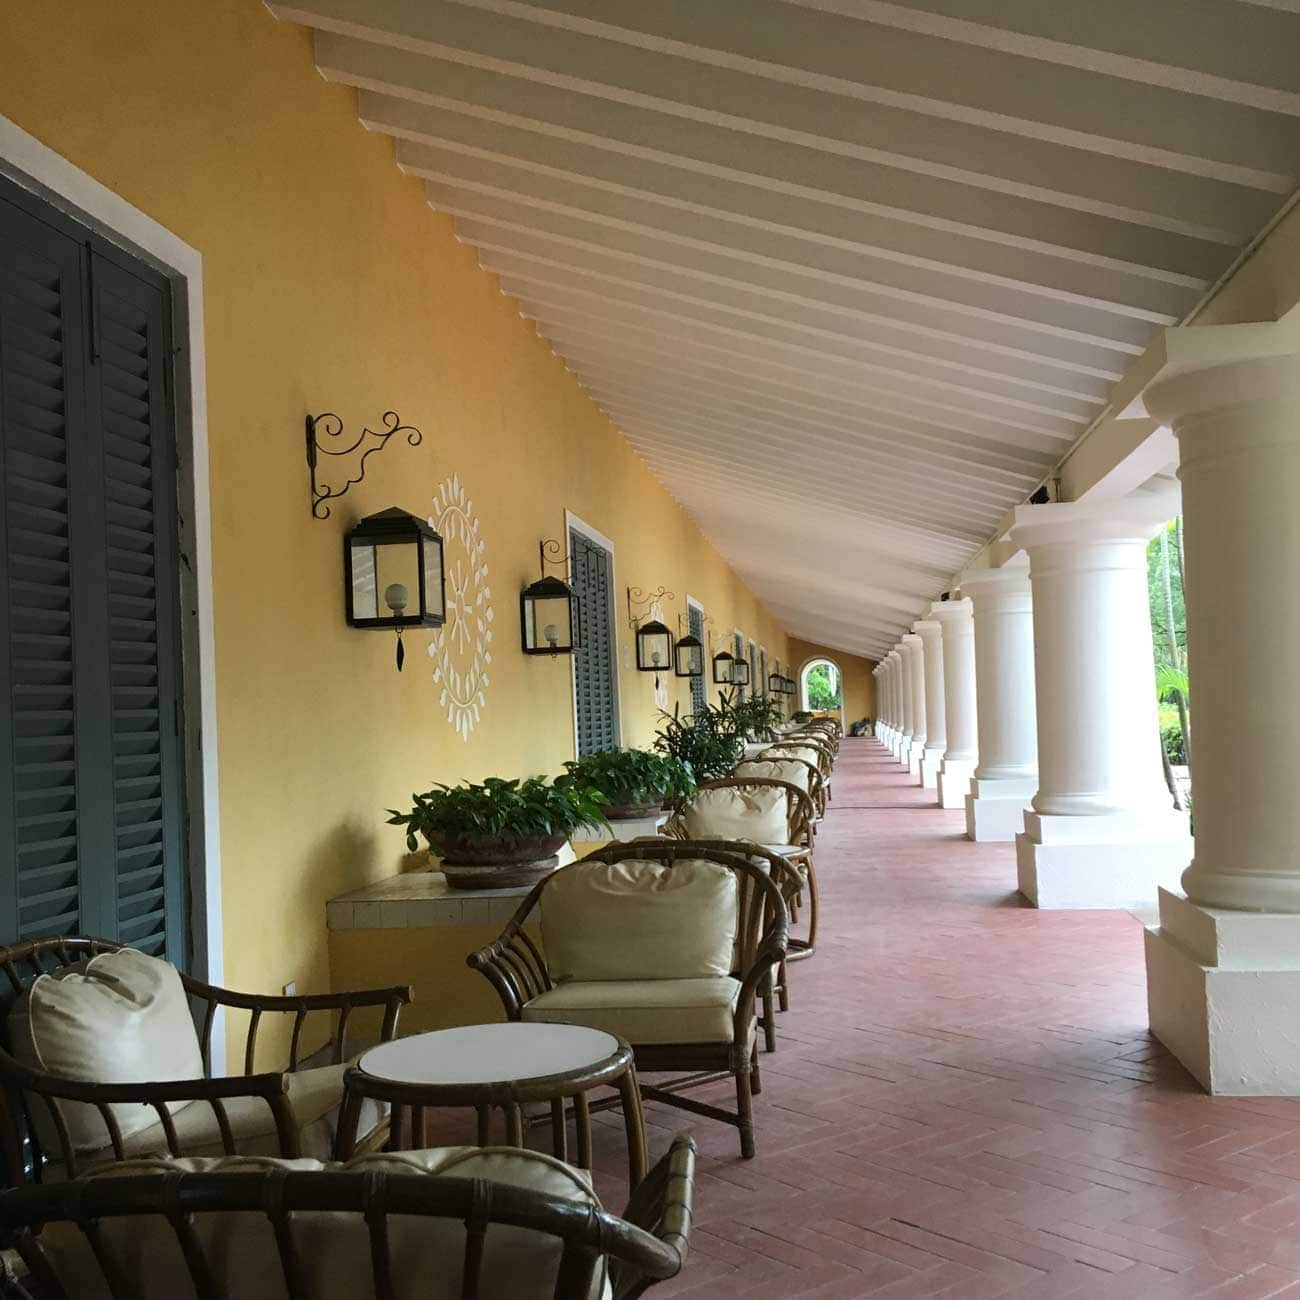 Regency Art Hotel outdoor pool chairs